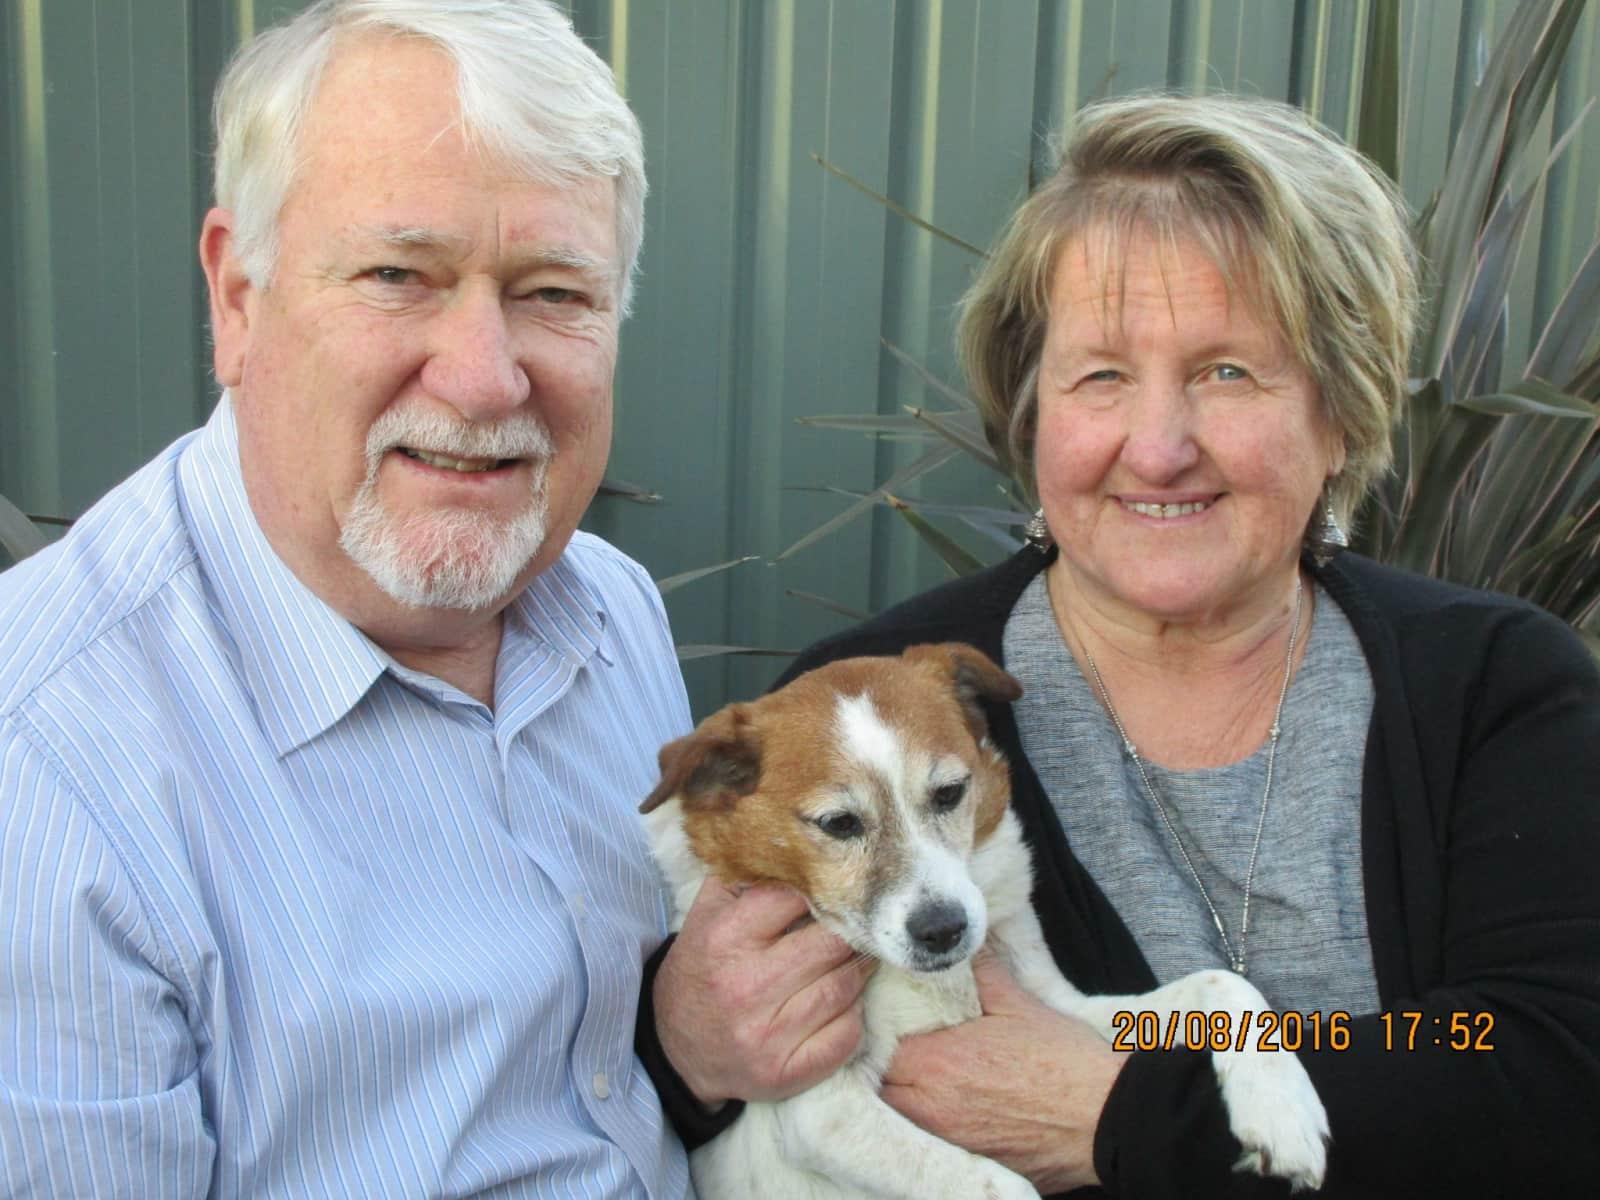 Allan & Ann from Croydon, New South Wales, Australia